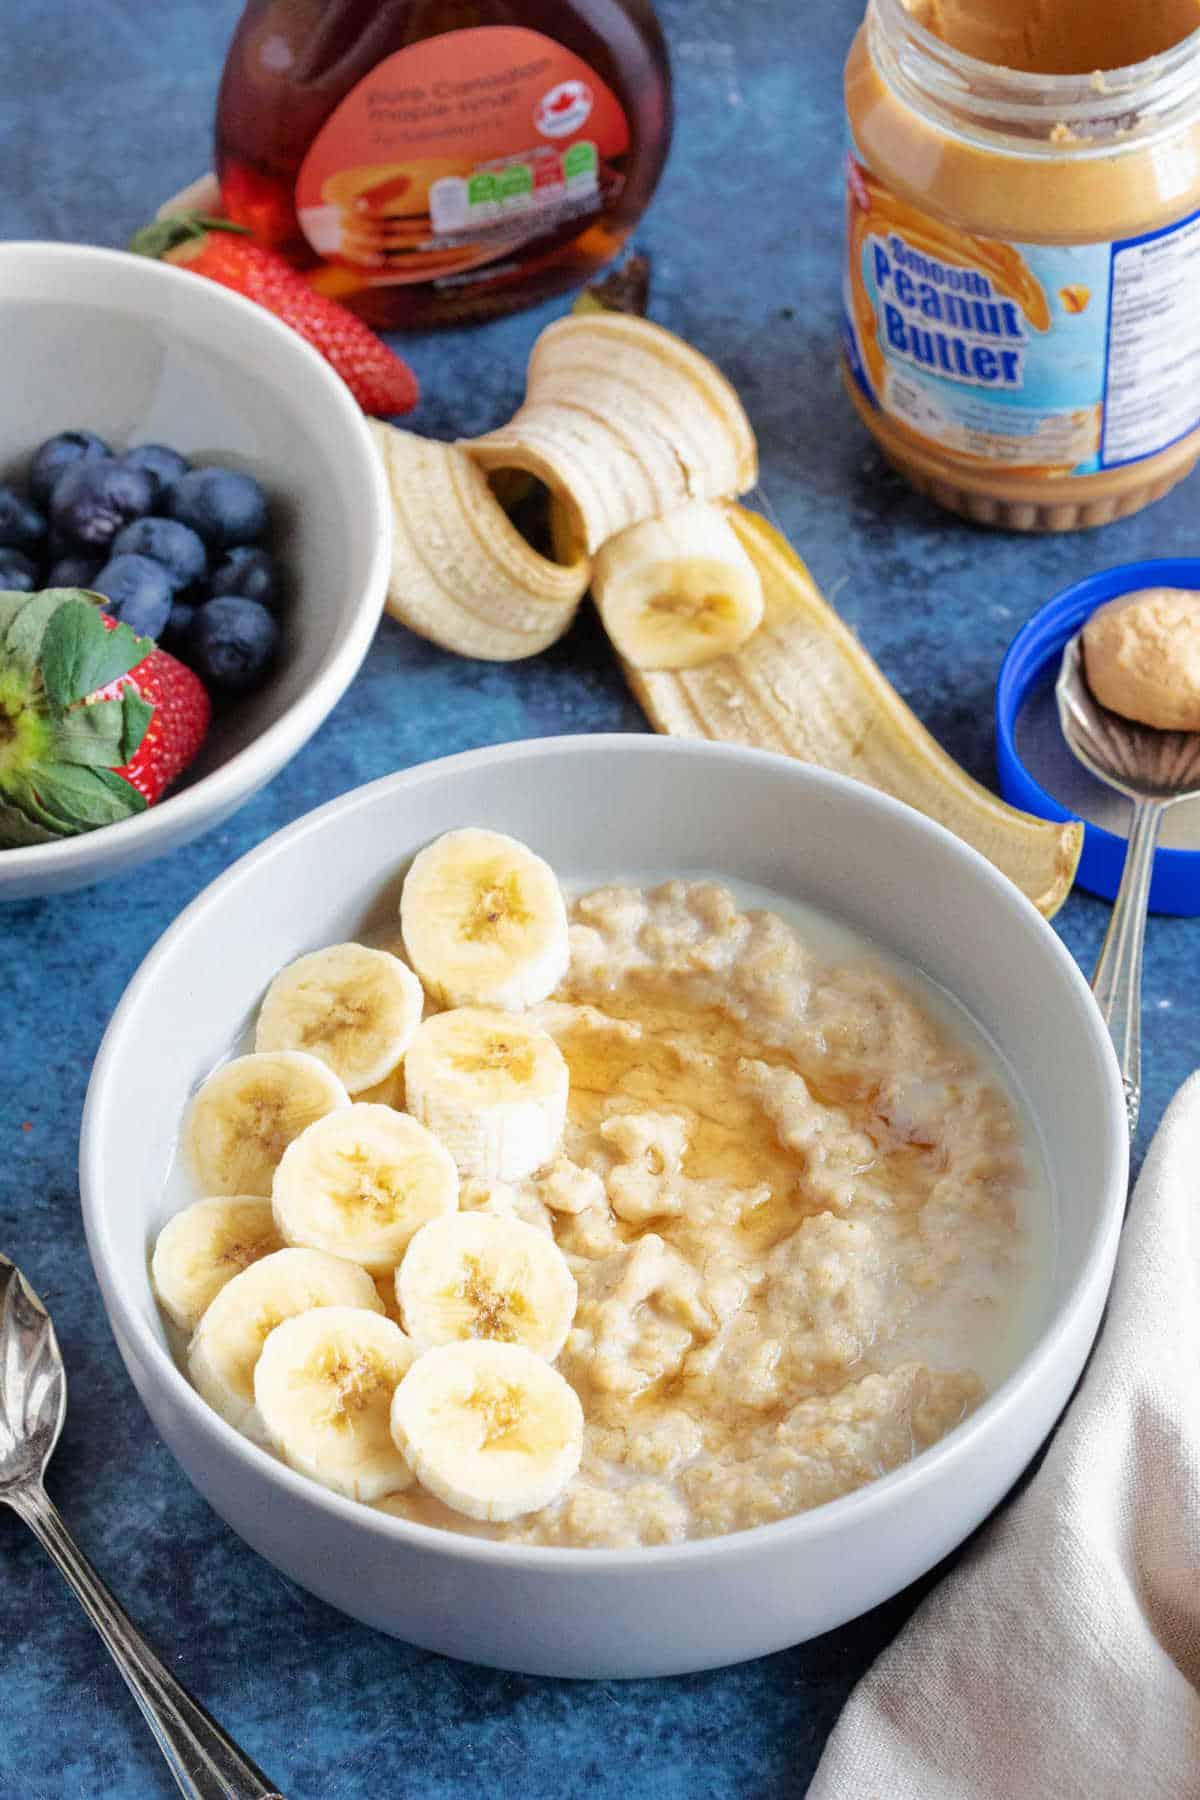 A bowl of peanut butter porridge with sliced banana.